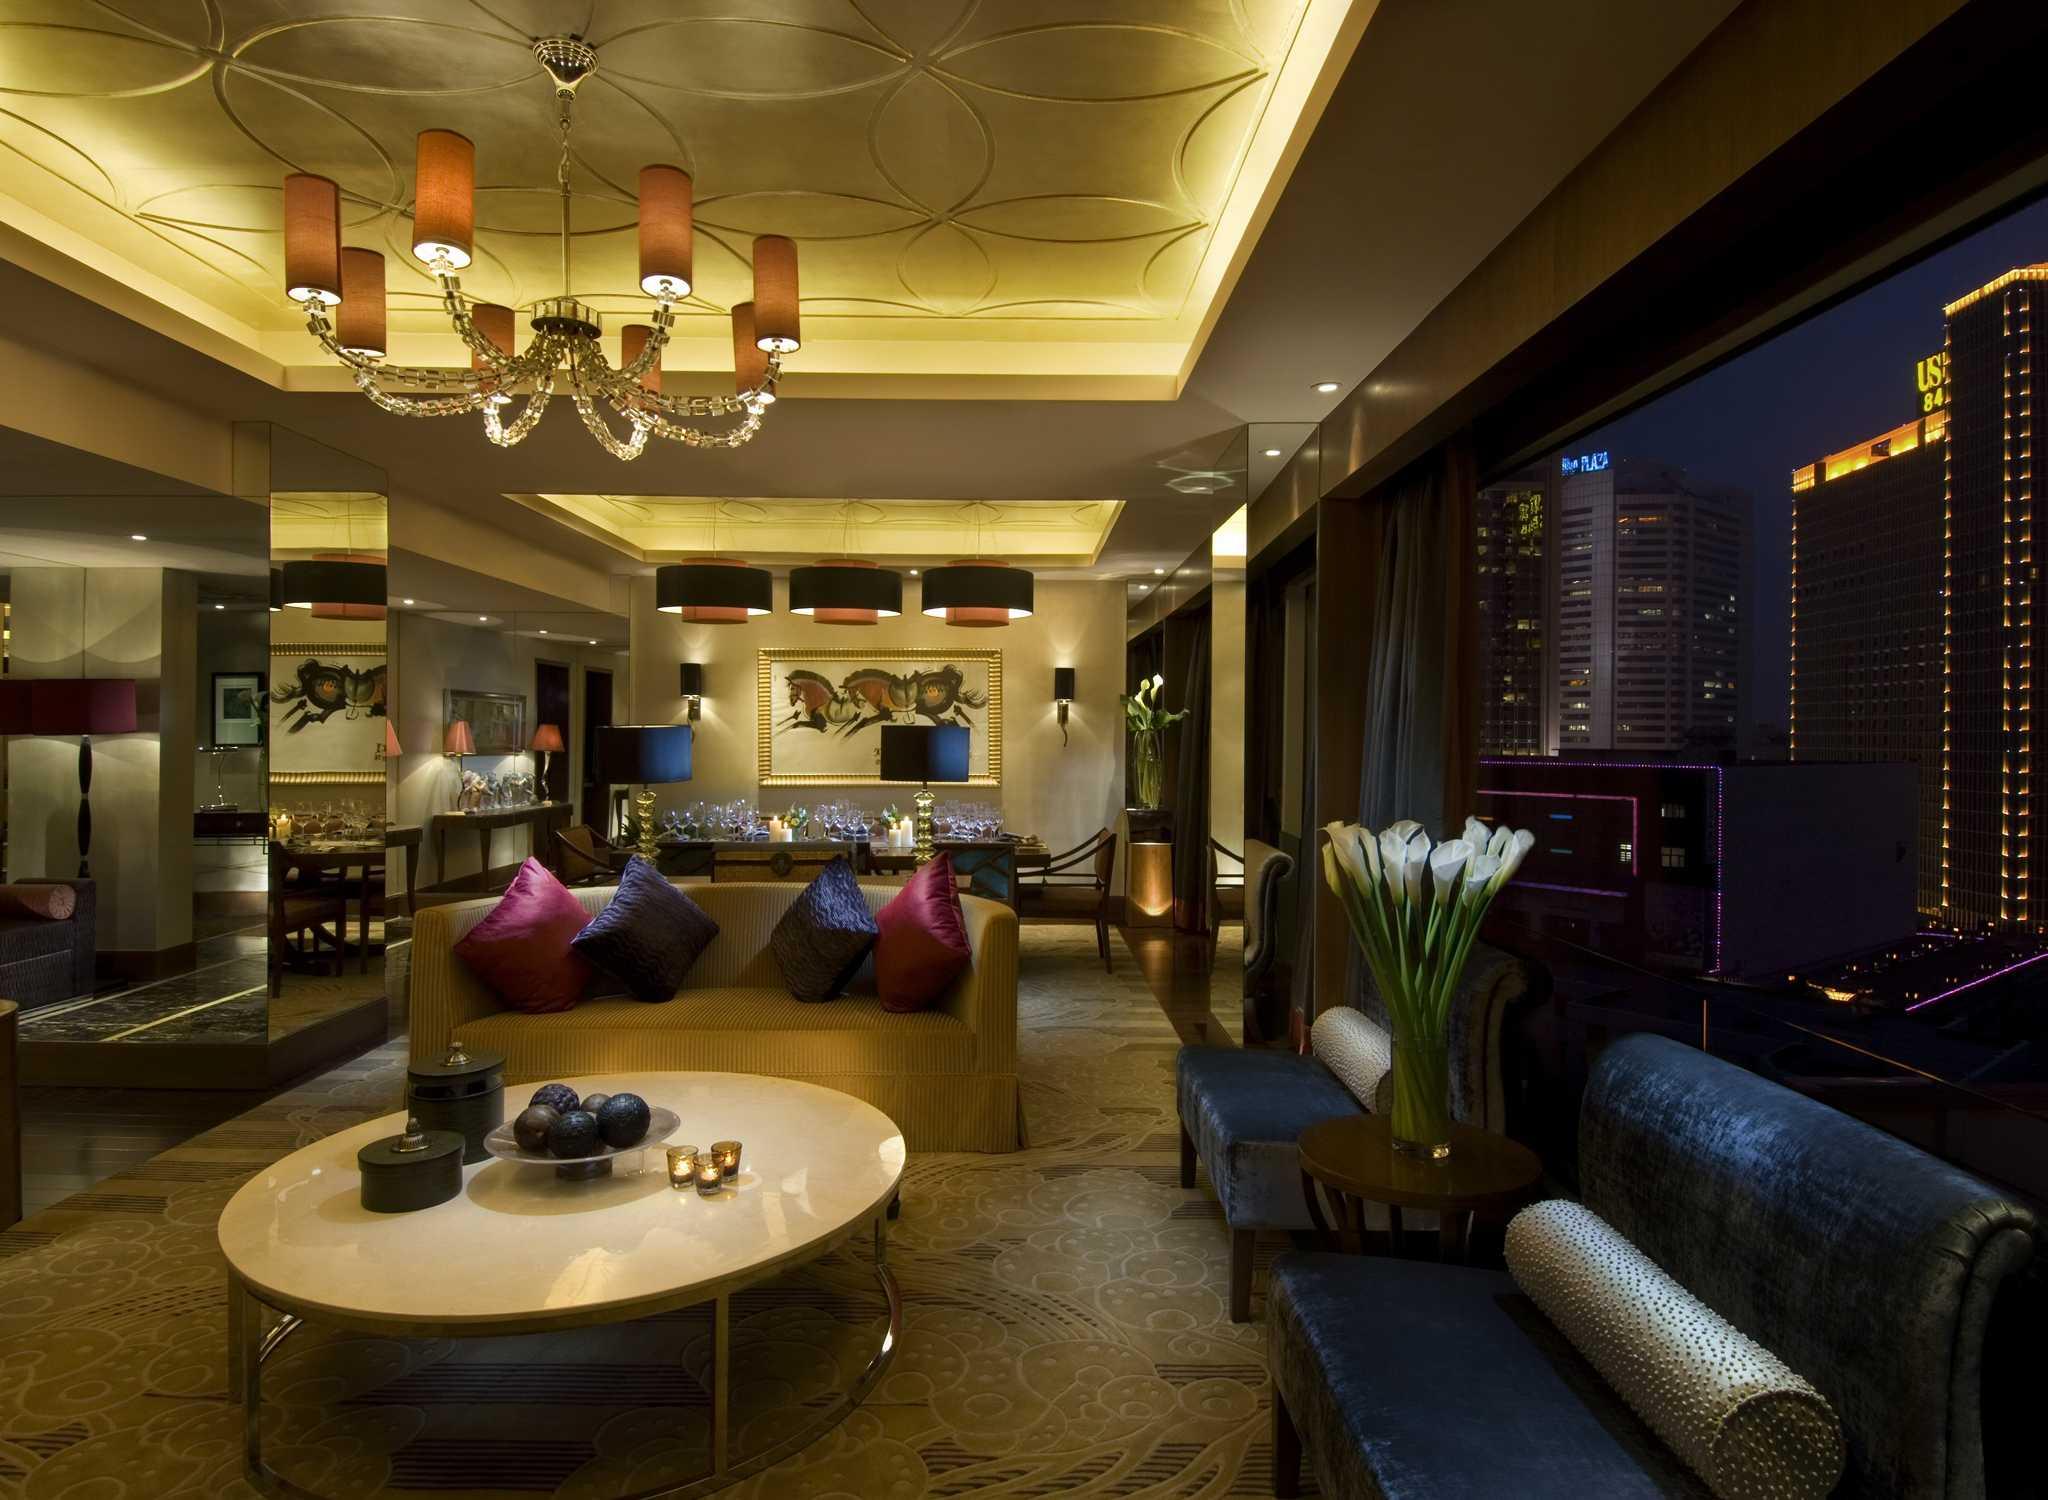 Hilton beijing china chairman suite